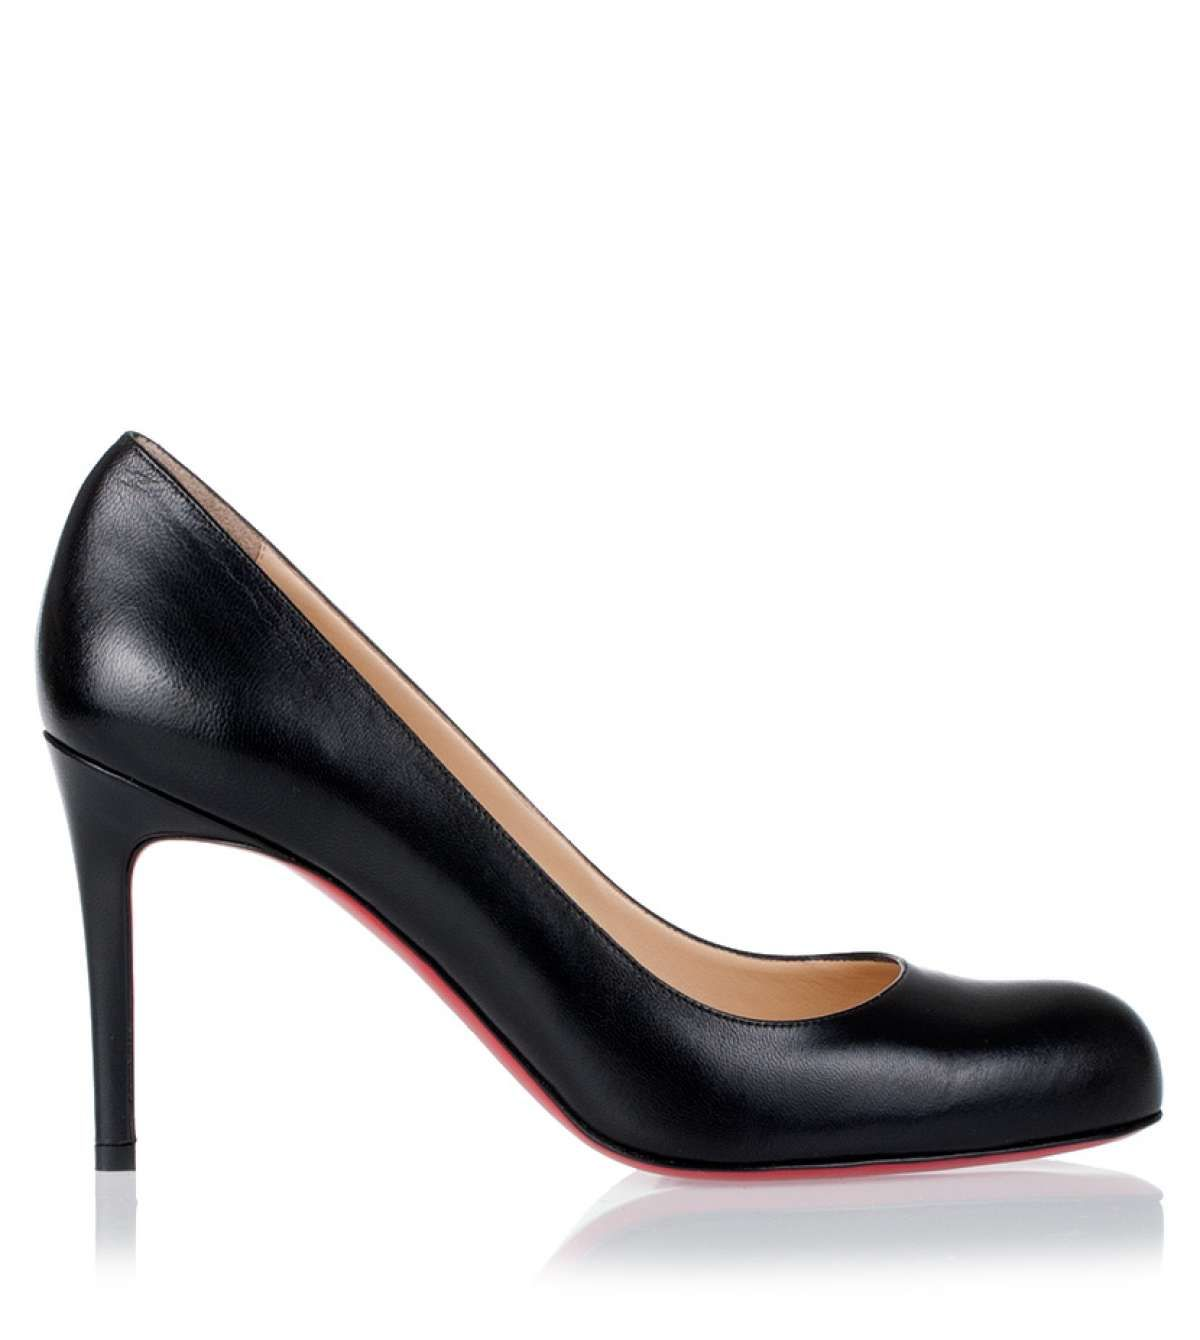 Simple pump 85 black leather Christian Louboutin - Savannah's